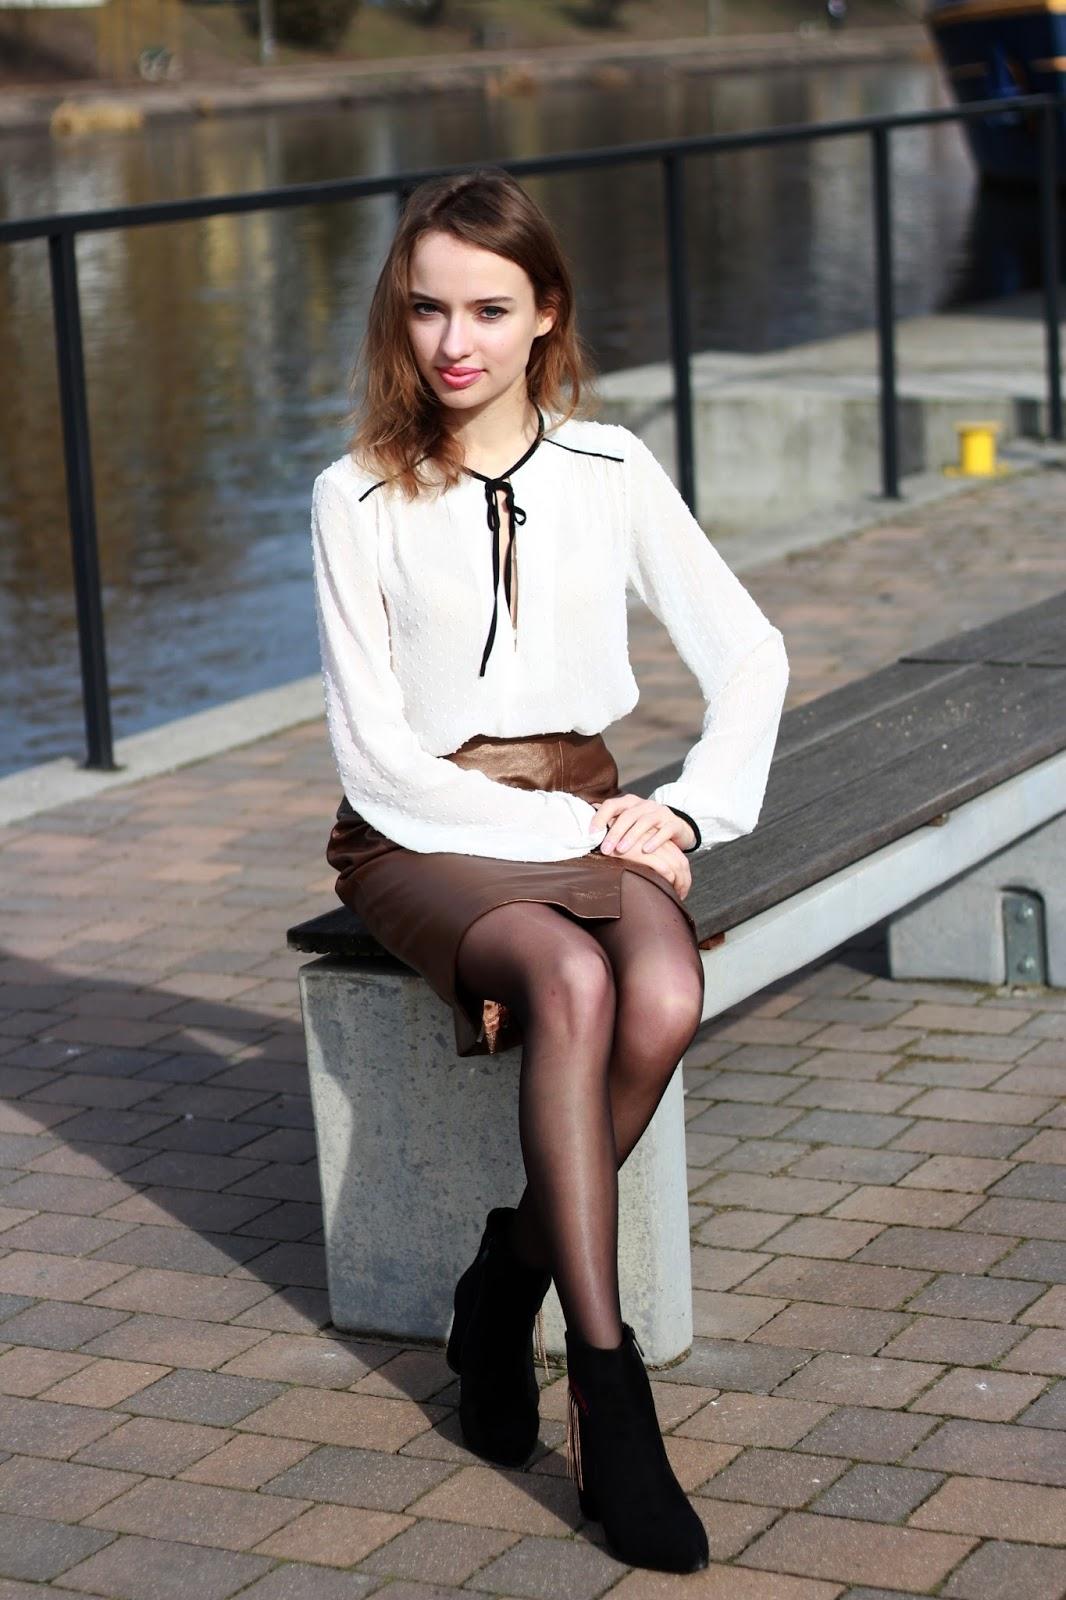 Thelongleggedstyleblogger: Street Style Legwear Looks Alterations-passion.blogspot